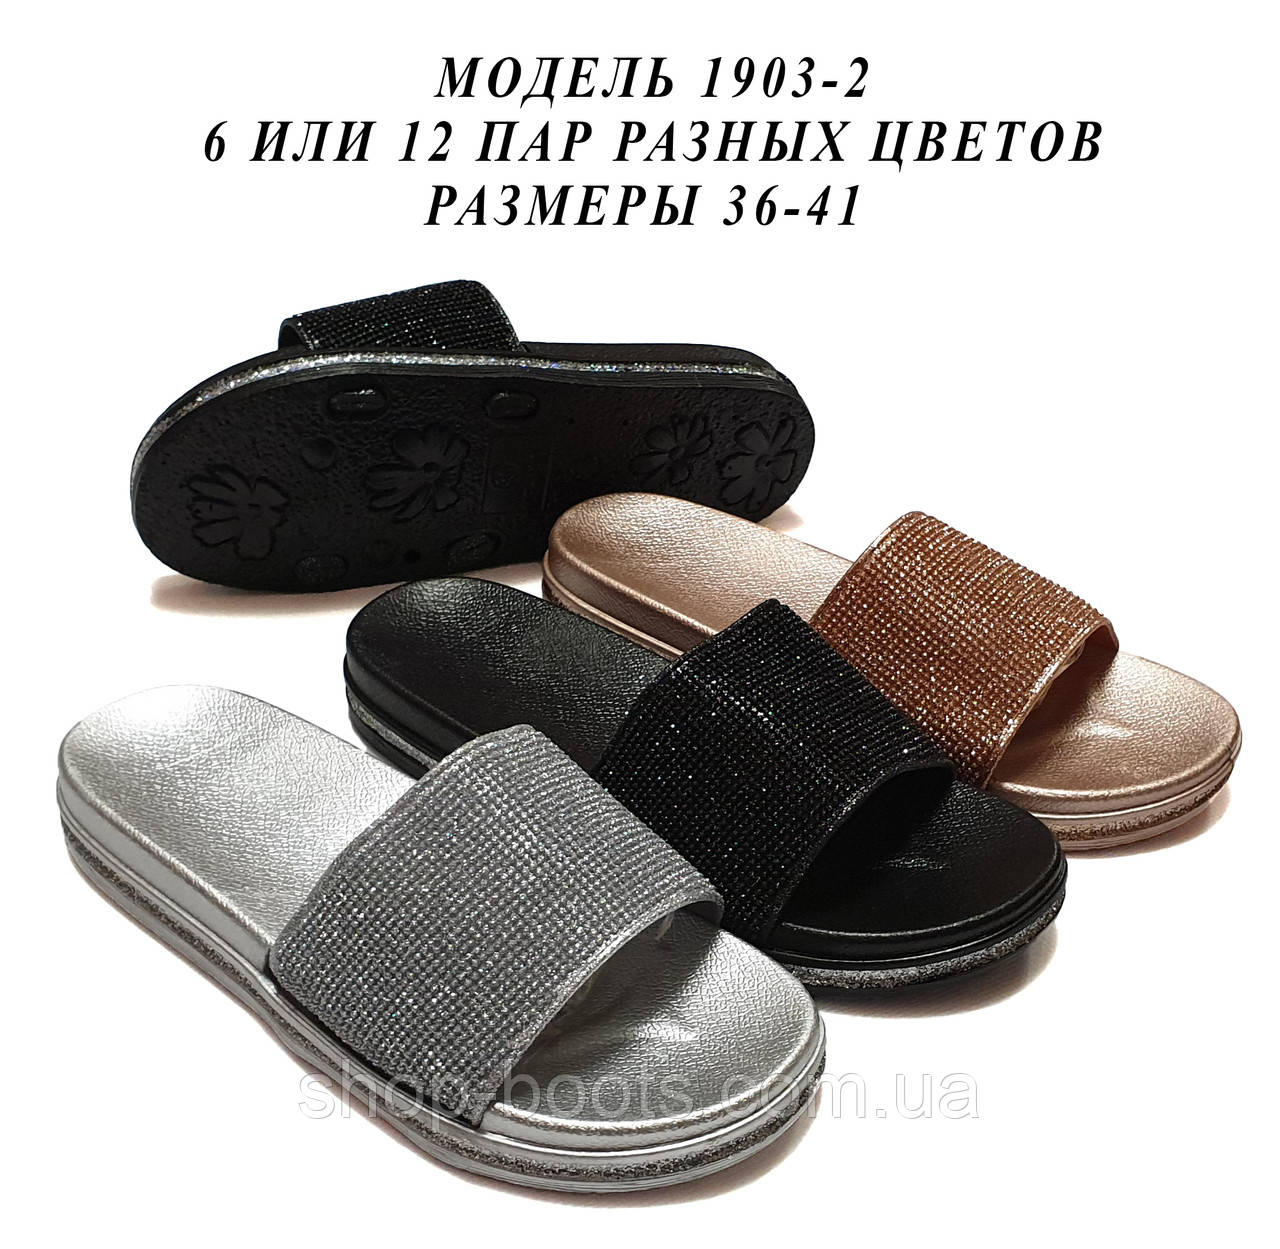 Женские шлепанцы оптом. 36-41рр. Модель шлепки 1903-2